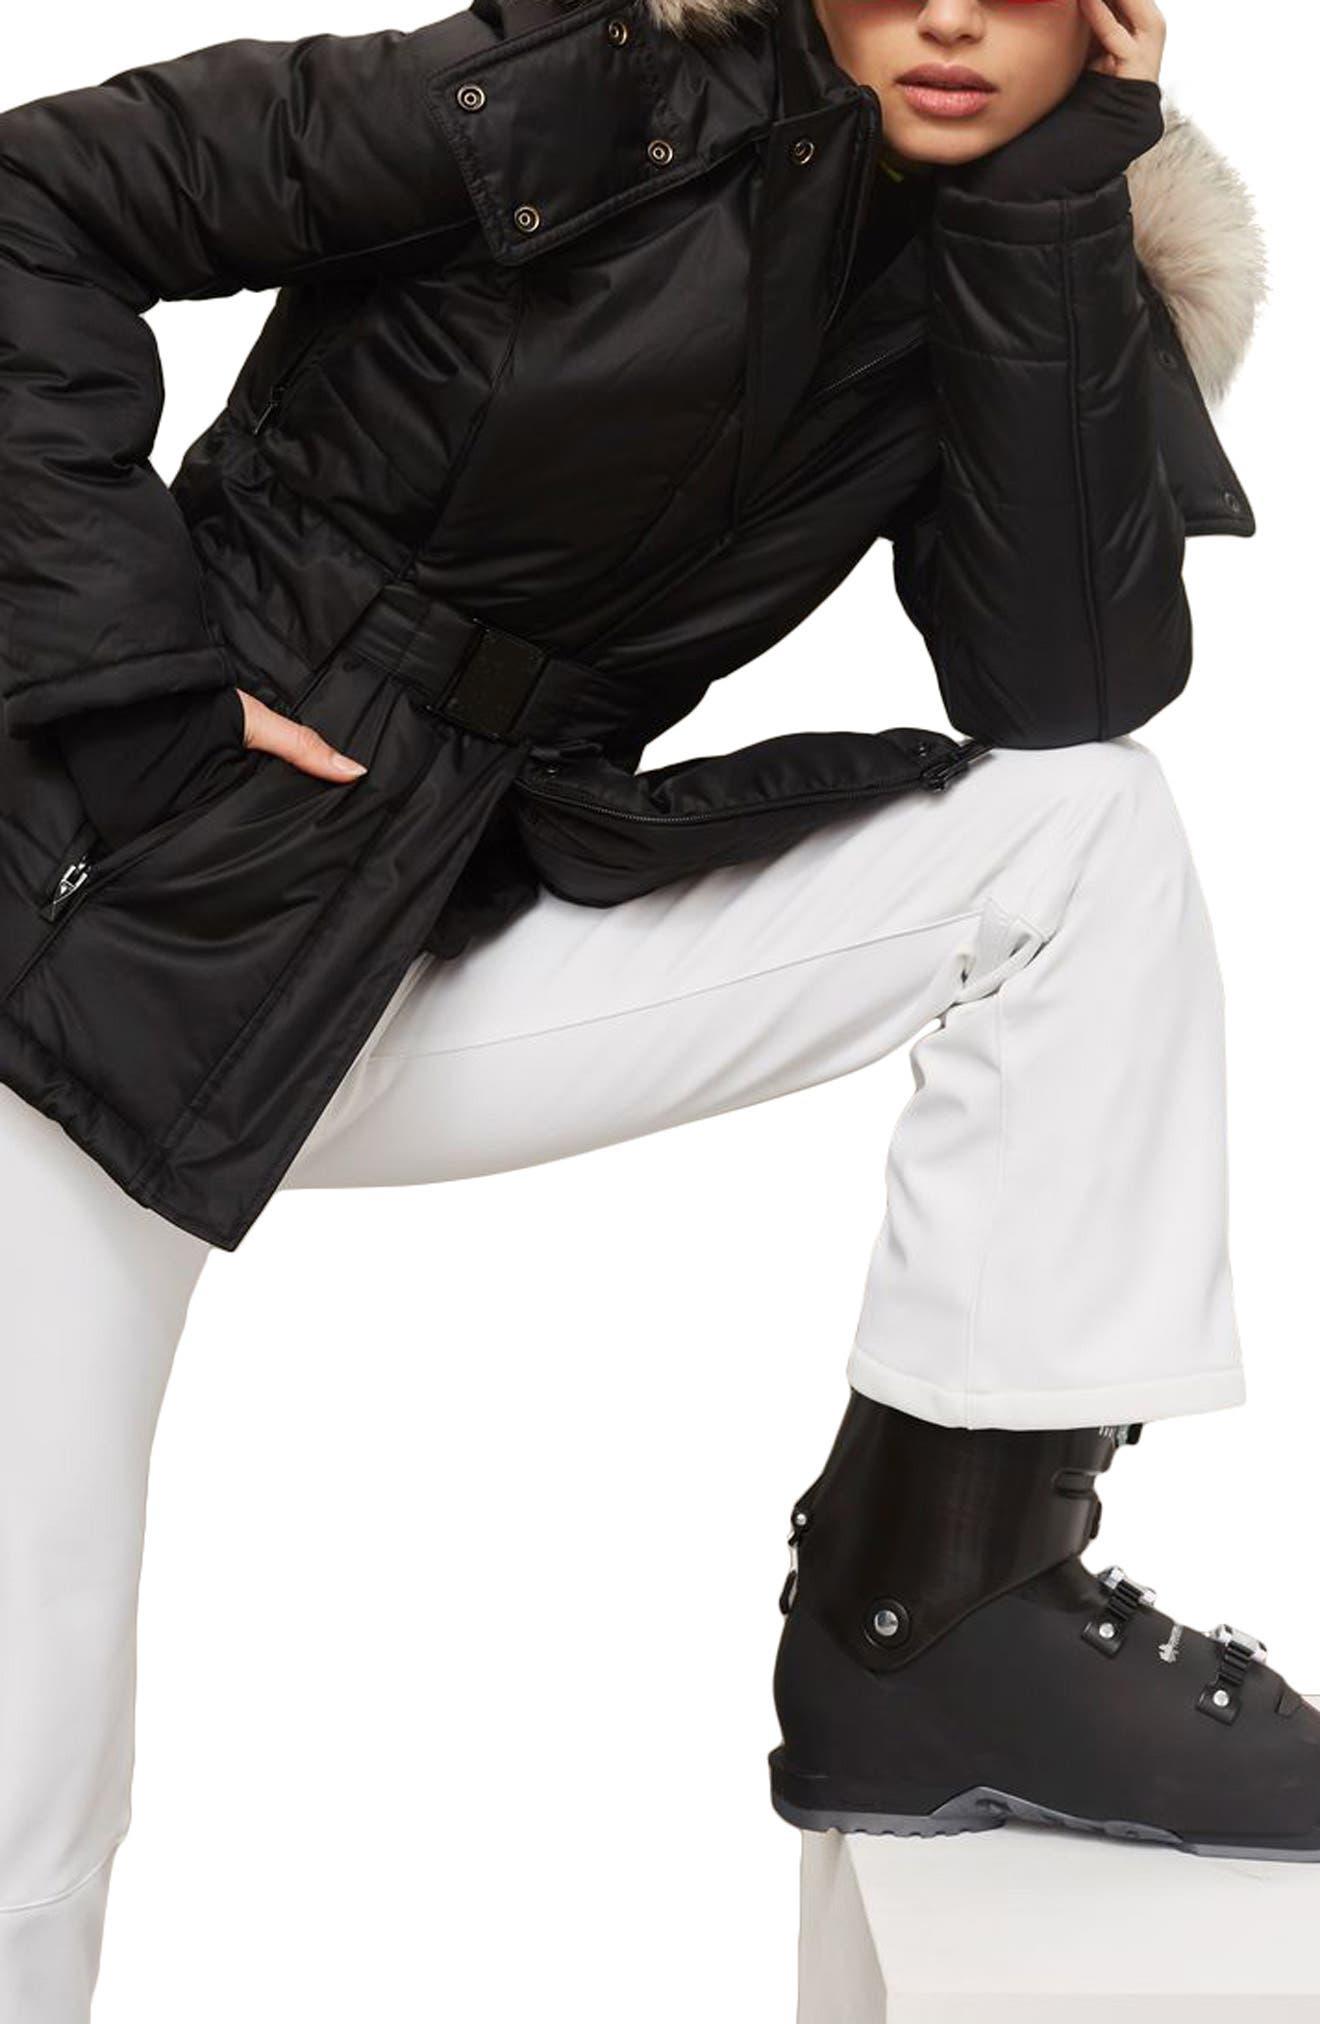 SNO Amazon Puffer Jacket,                             Alternate thumbnail 3, color,                             Black